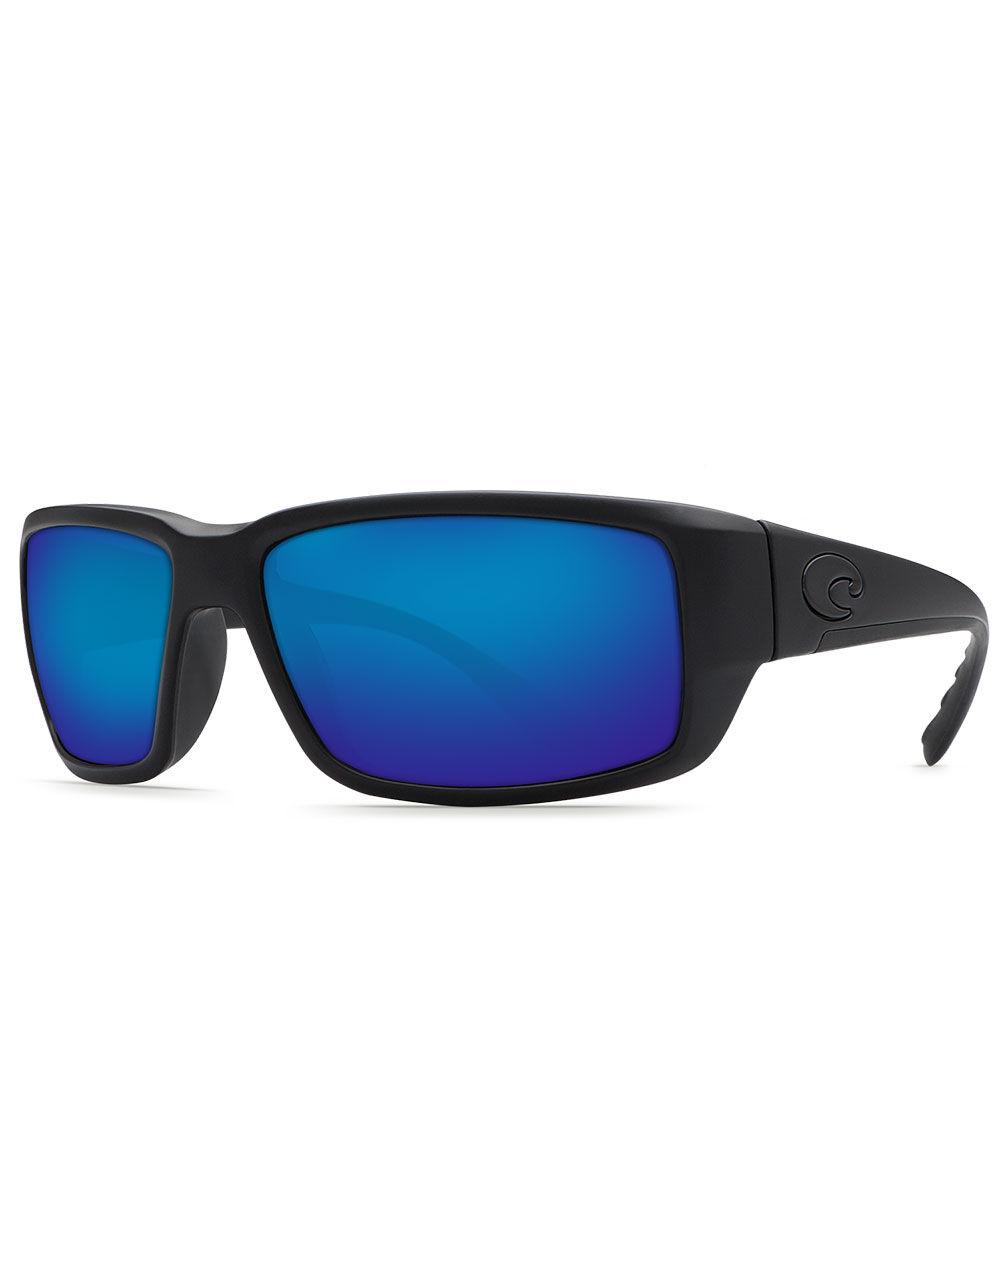 Image of COSTA FANTAIL BLACK & BLUE POLARIZED SUNGLASSES